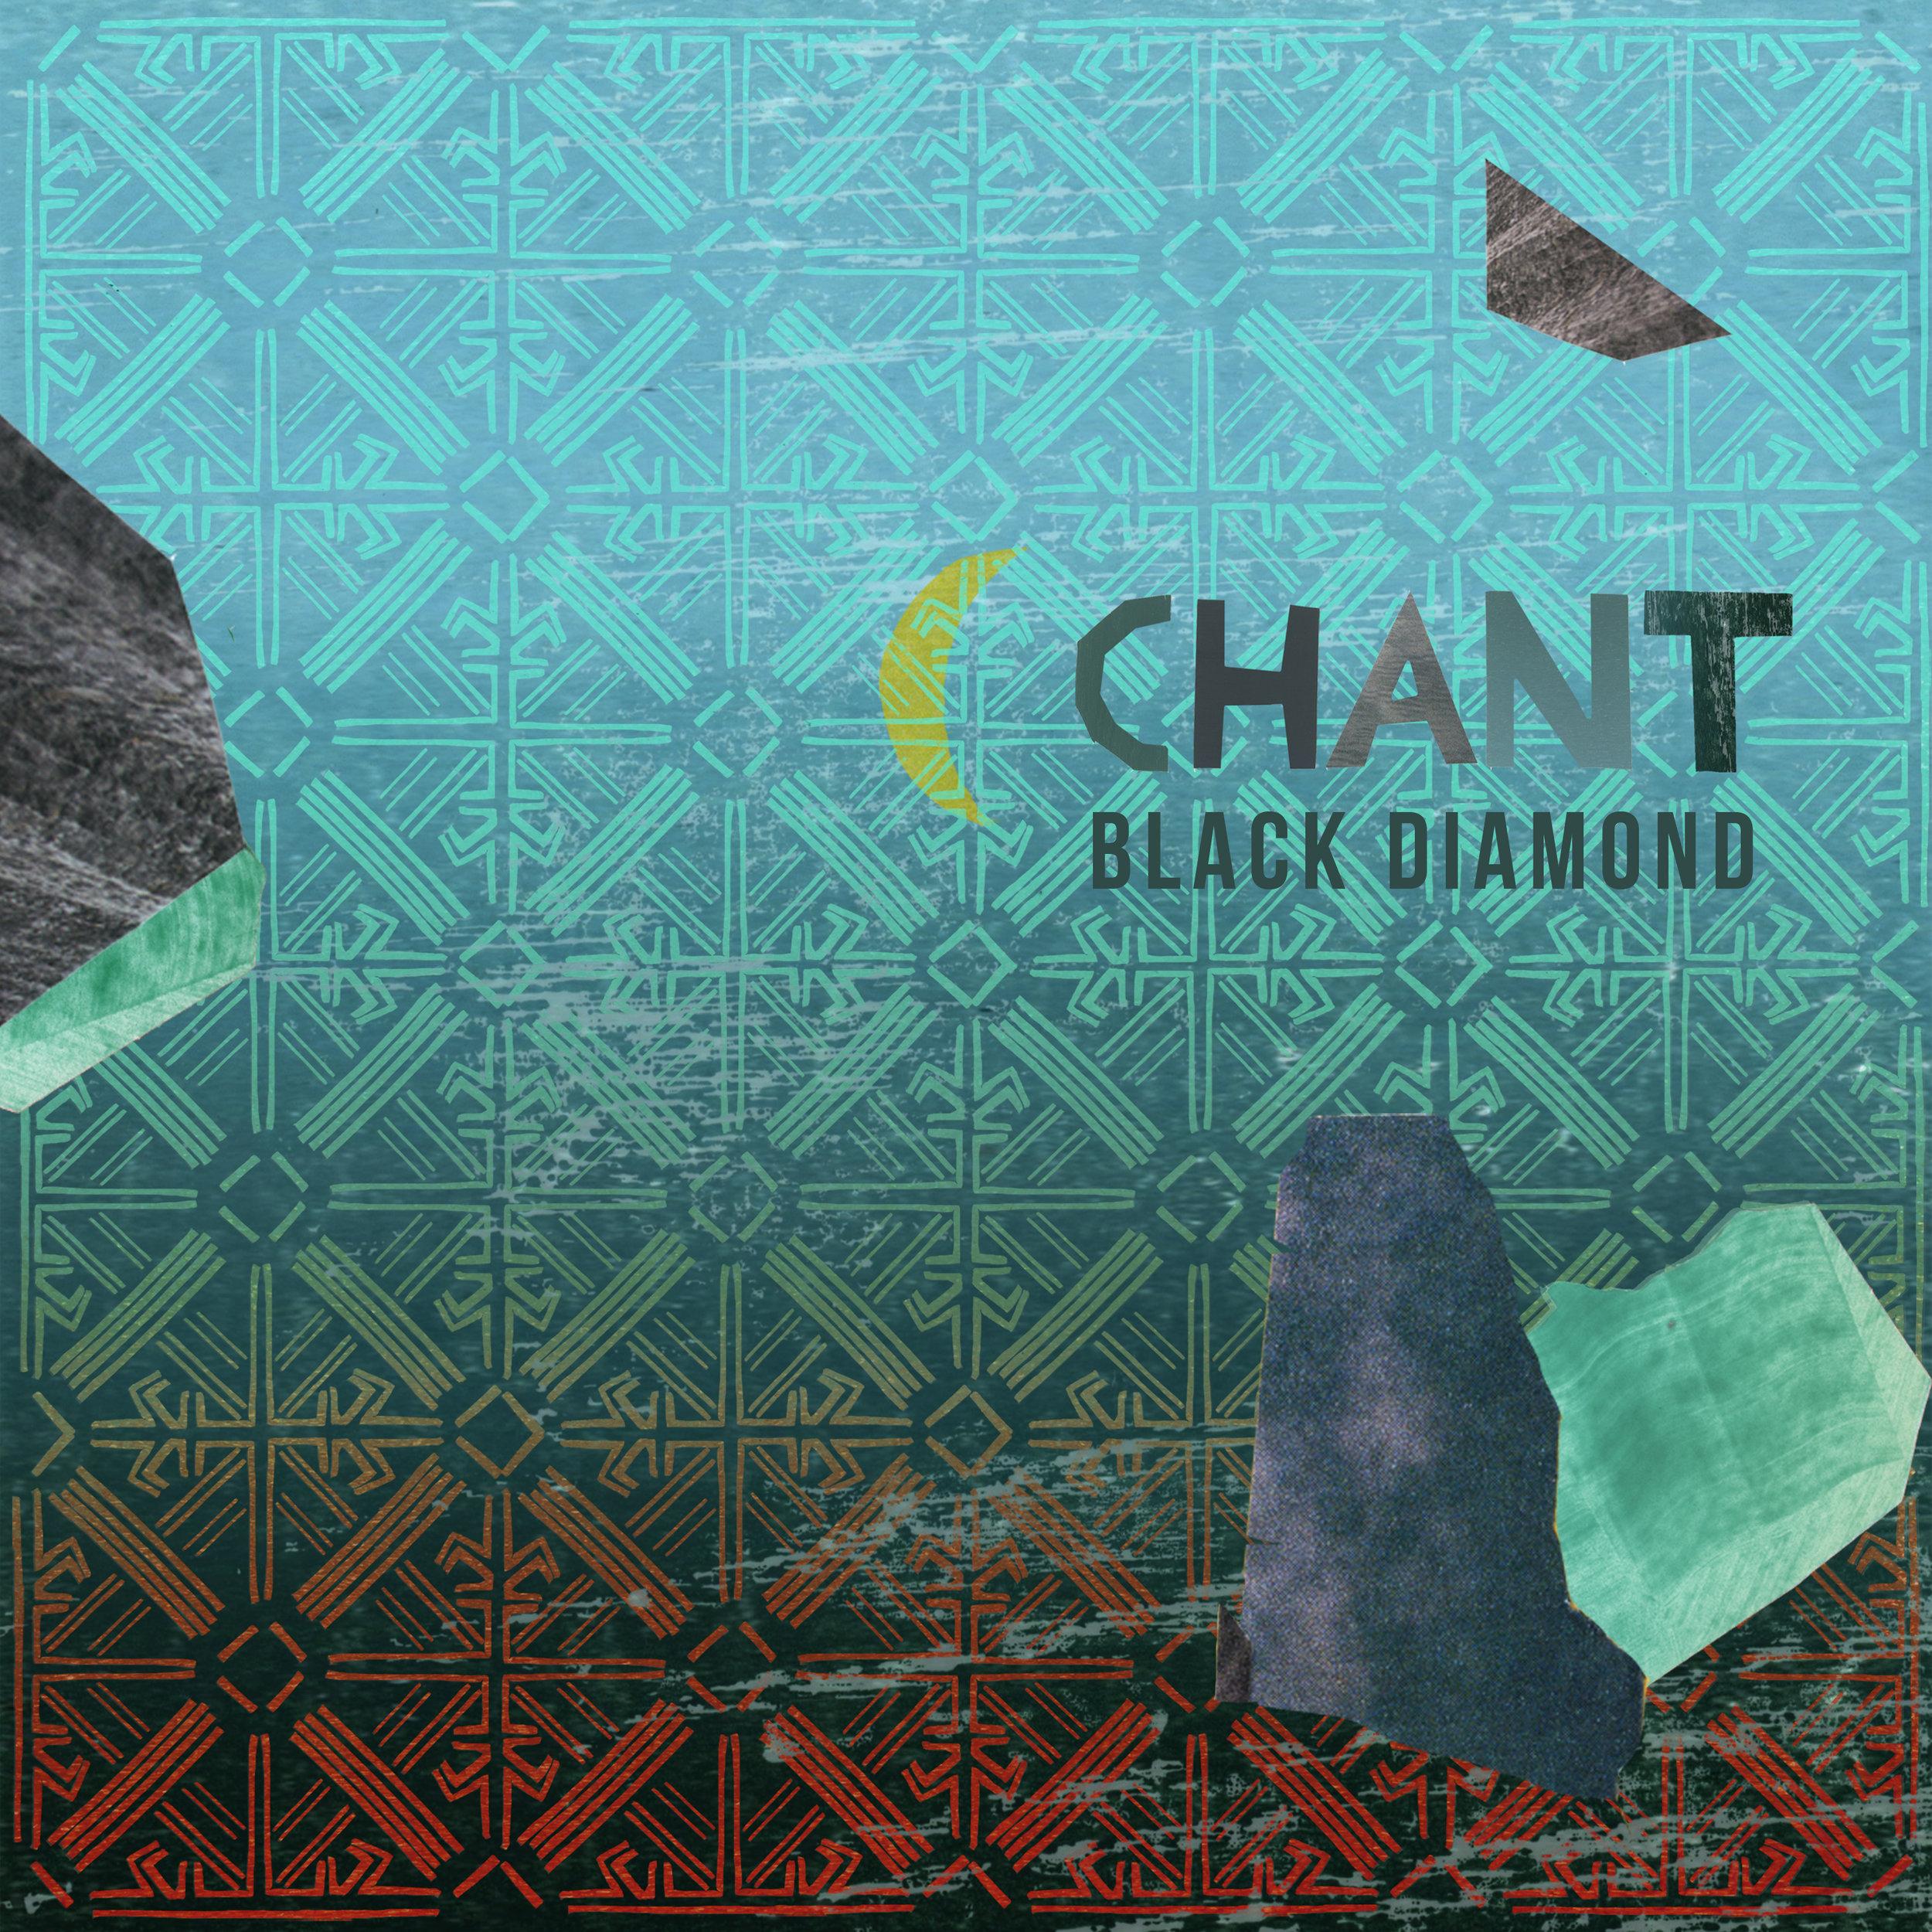 3000x3000 Chant Cover.jpg